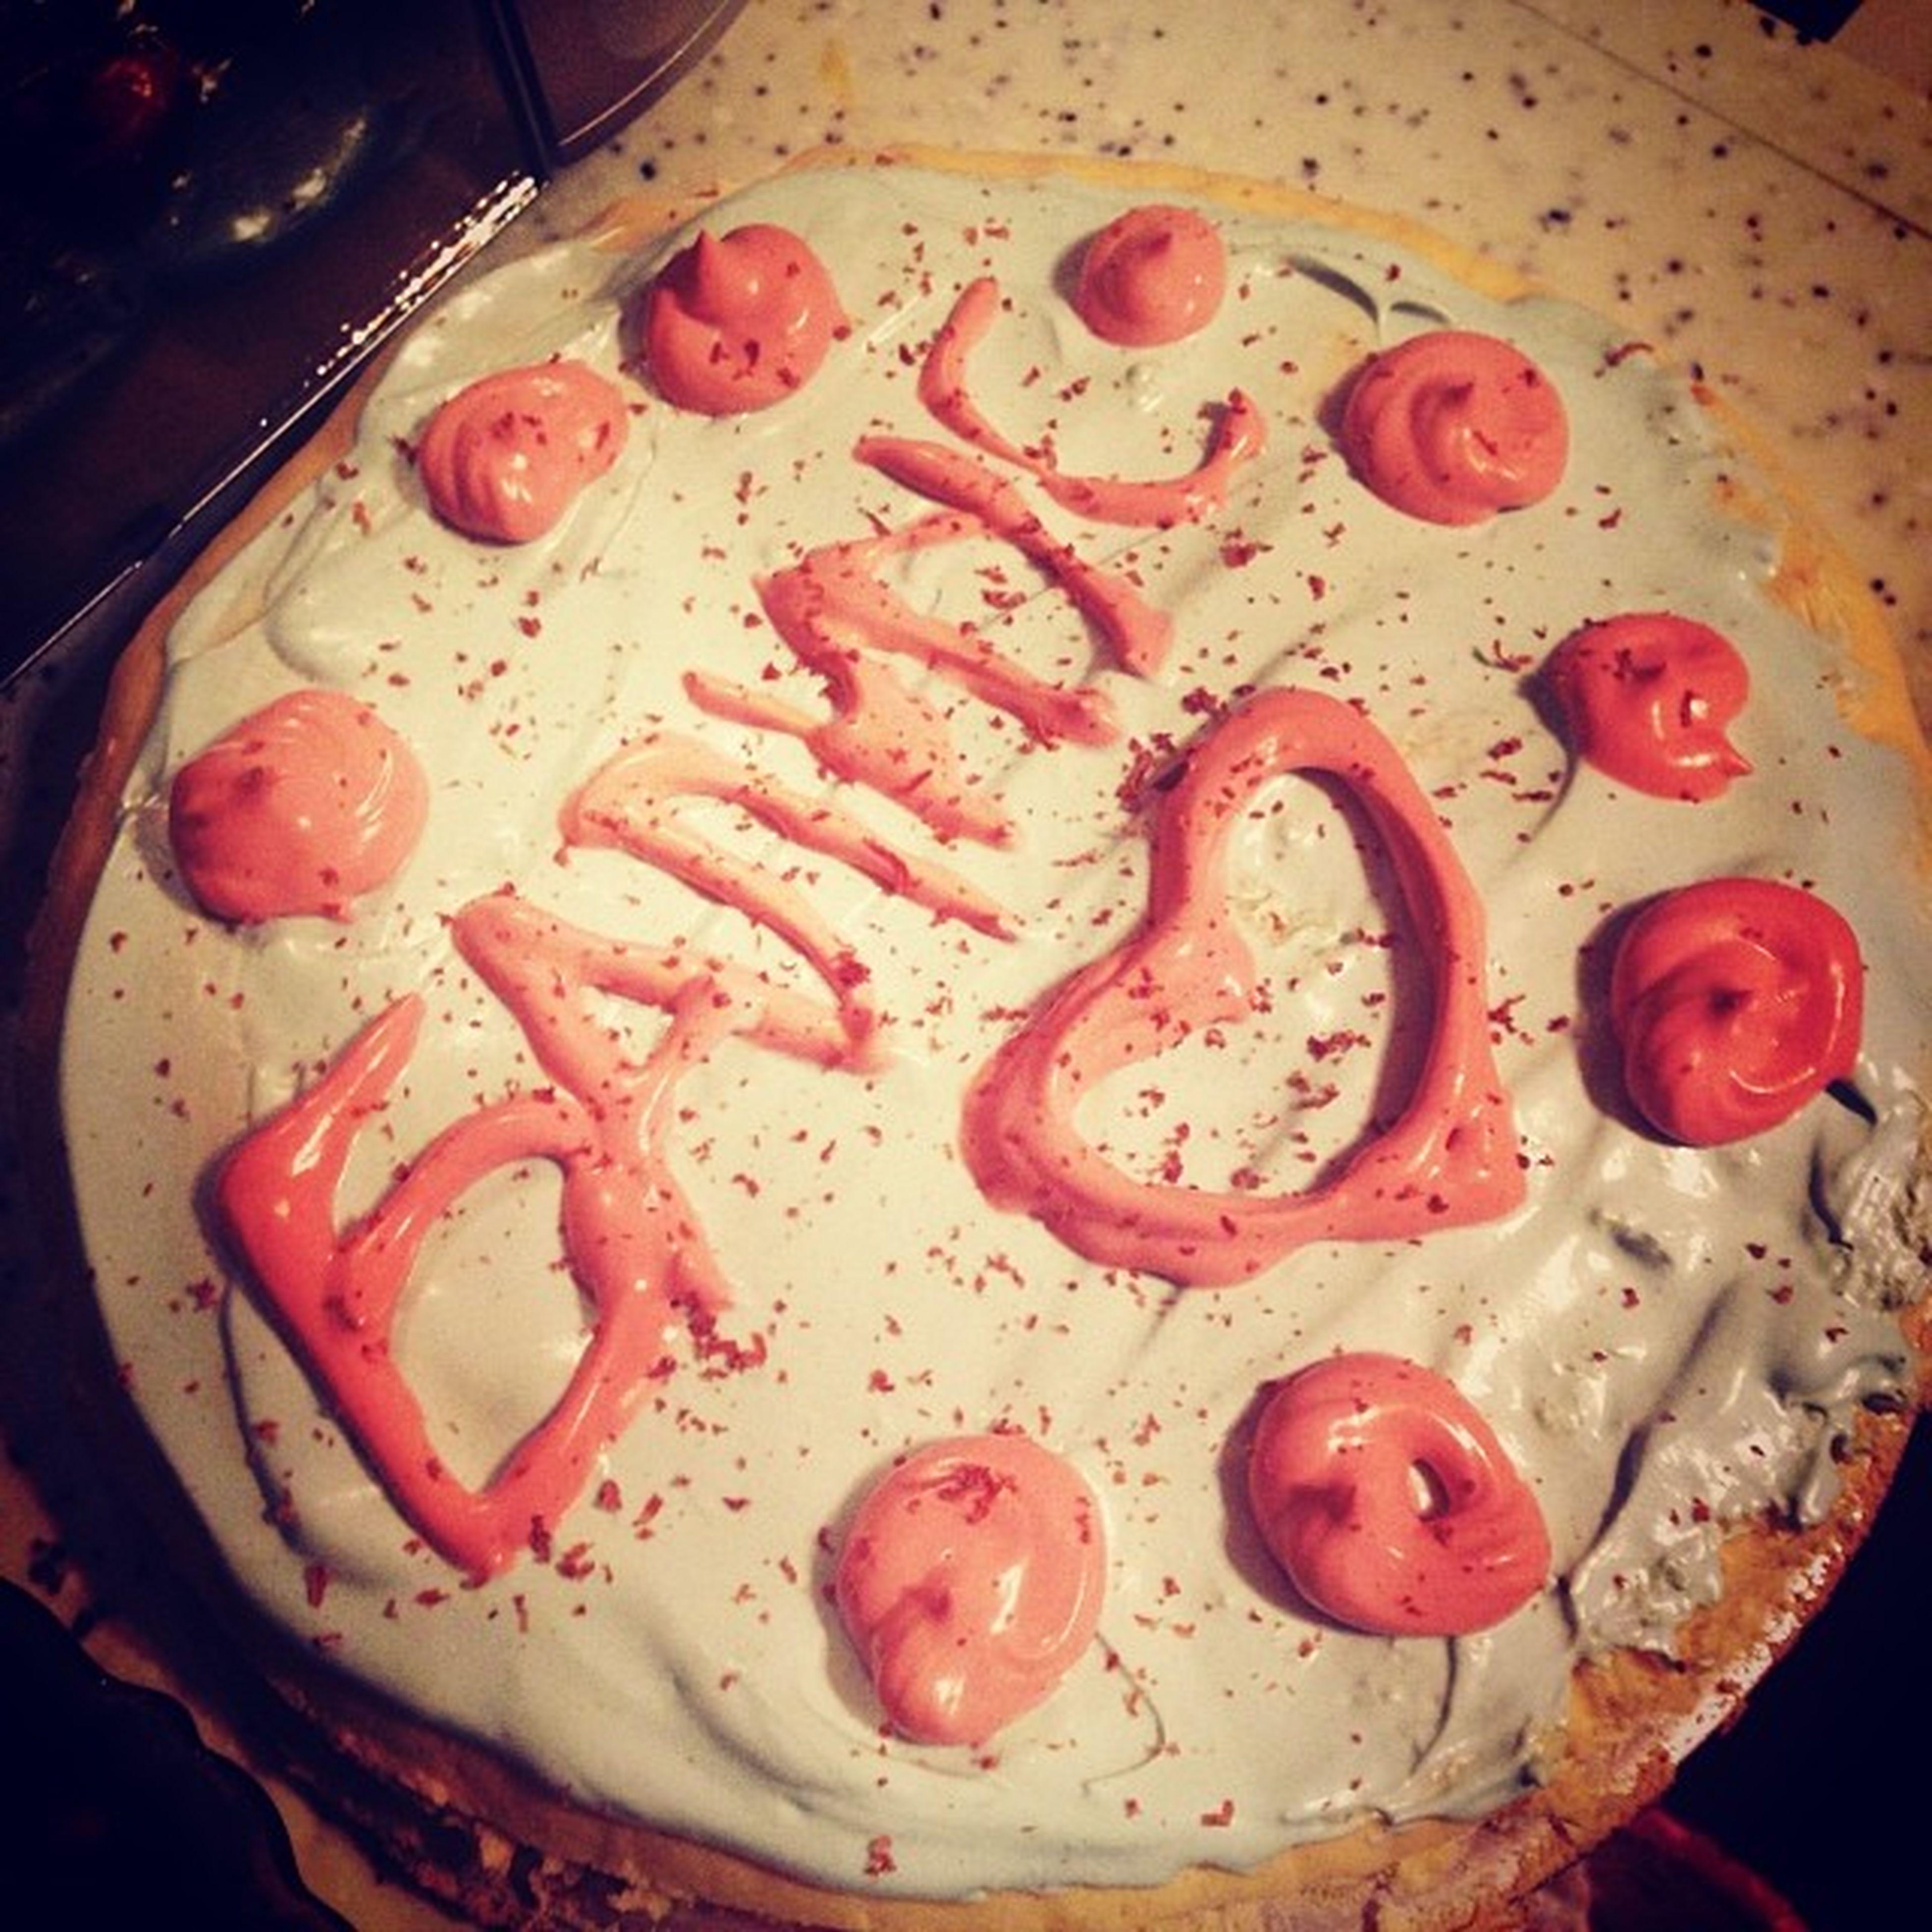 Hamgin Goy Amttai Cake <3 ene oni svvlin hagassain udur amidrlin dursamjtai udrudin neg <3